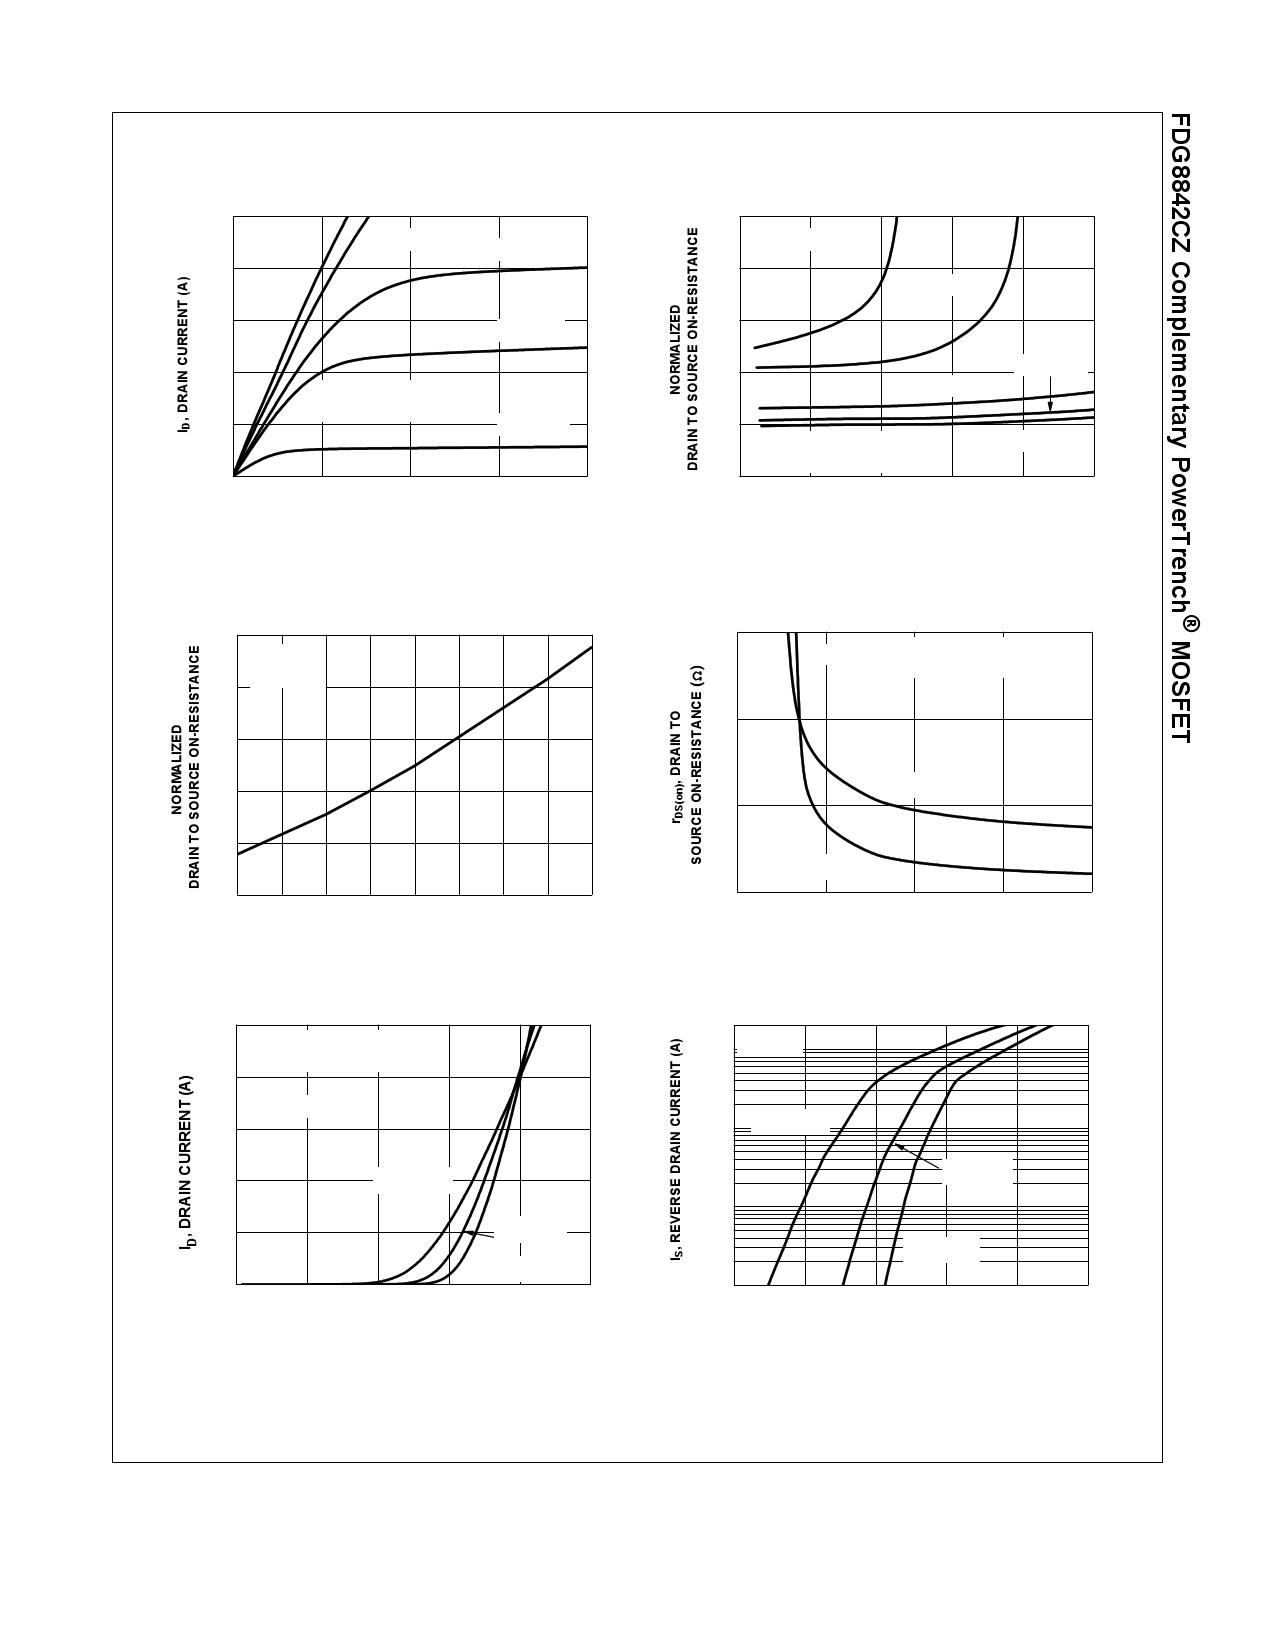 FDG8842CZ pdf, 반도체, 판매, 대치품